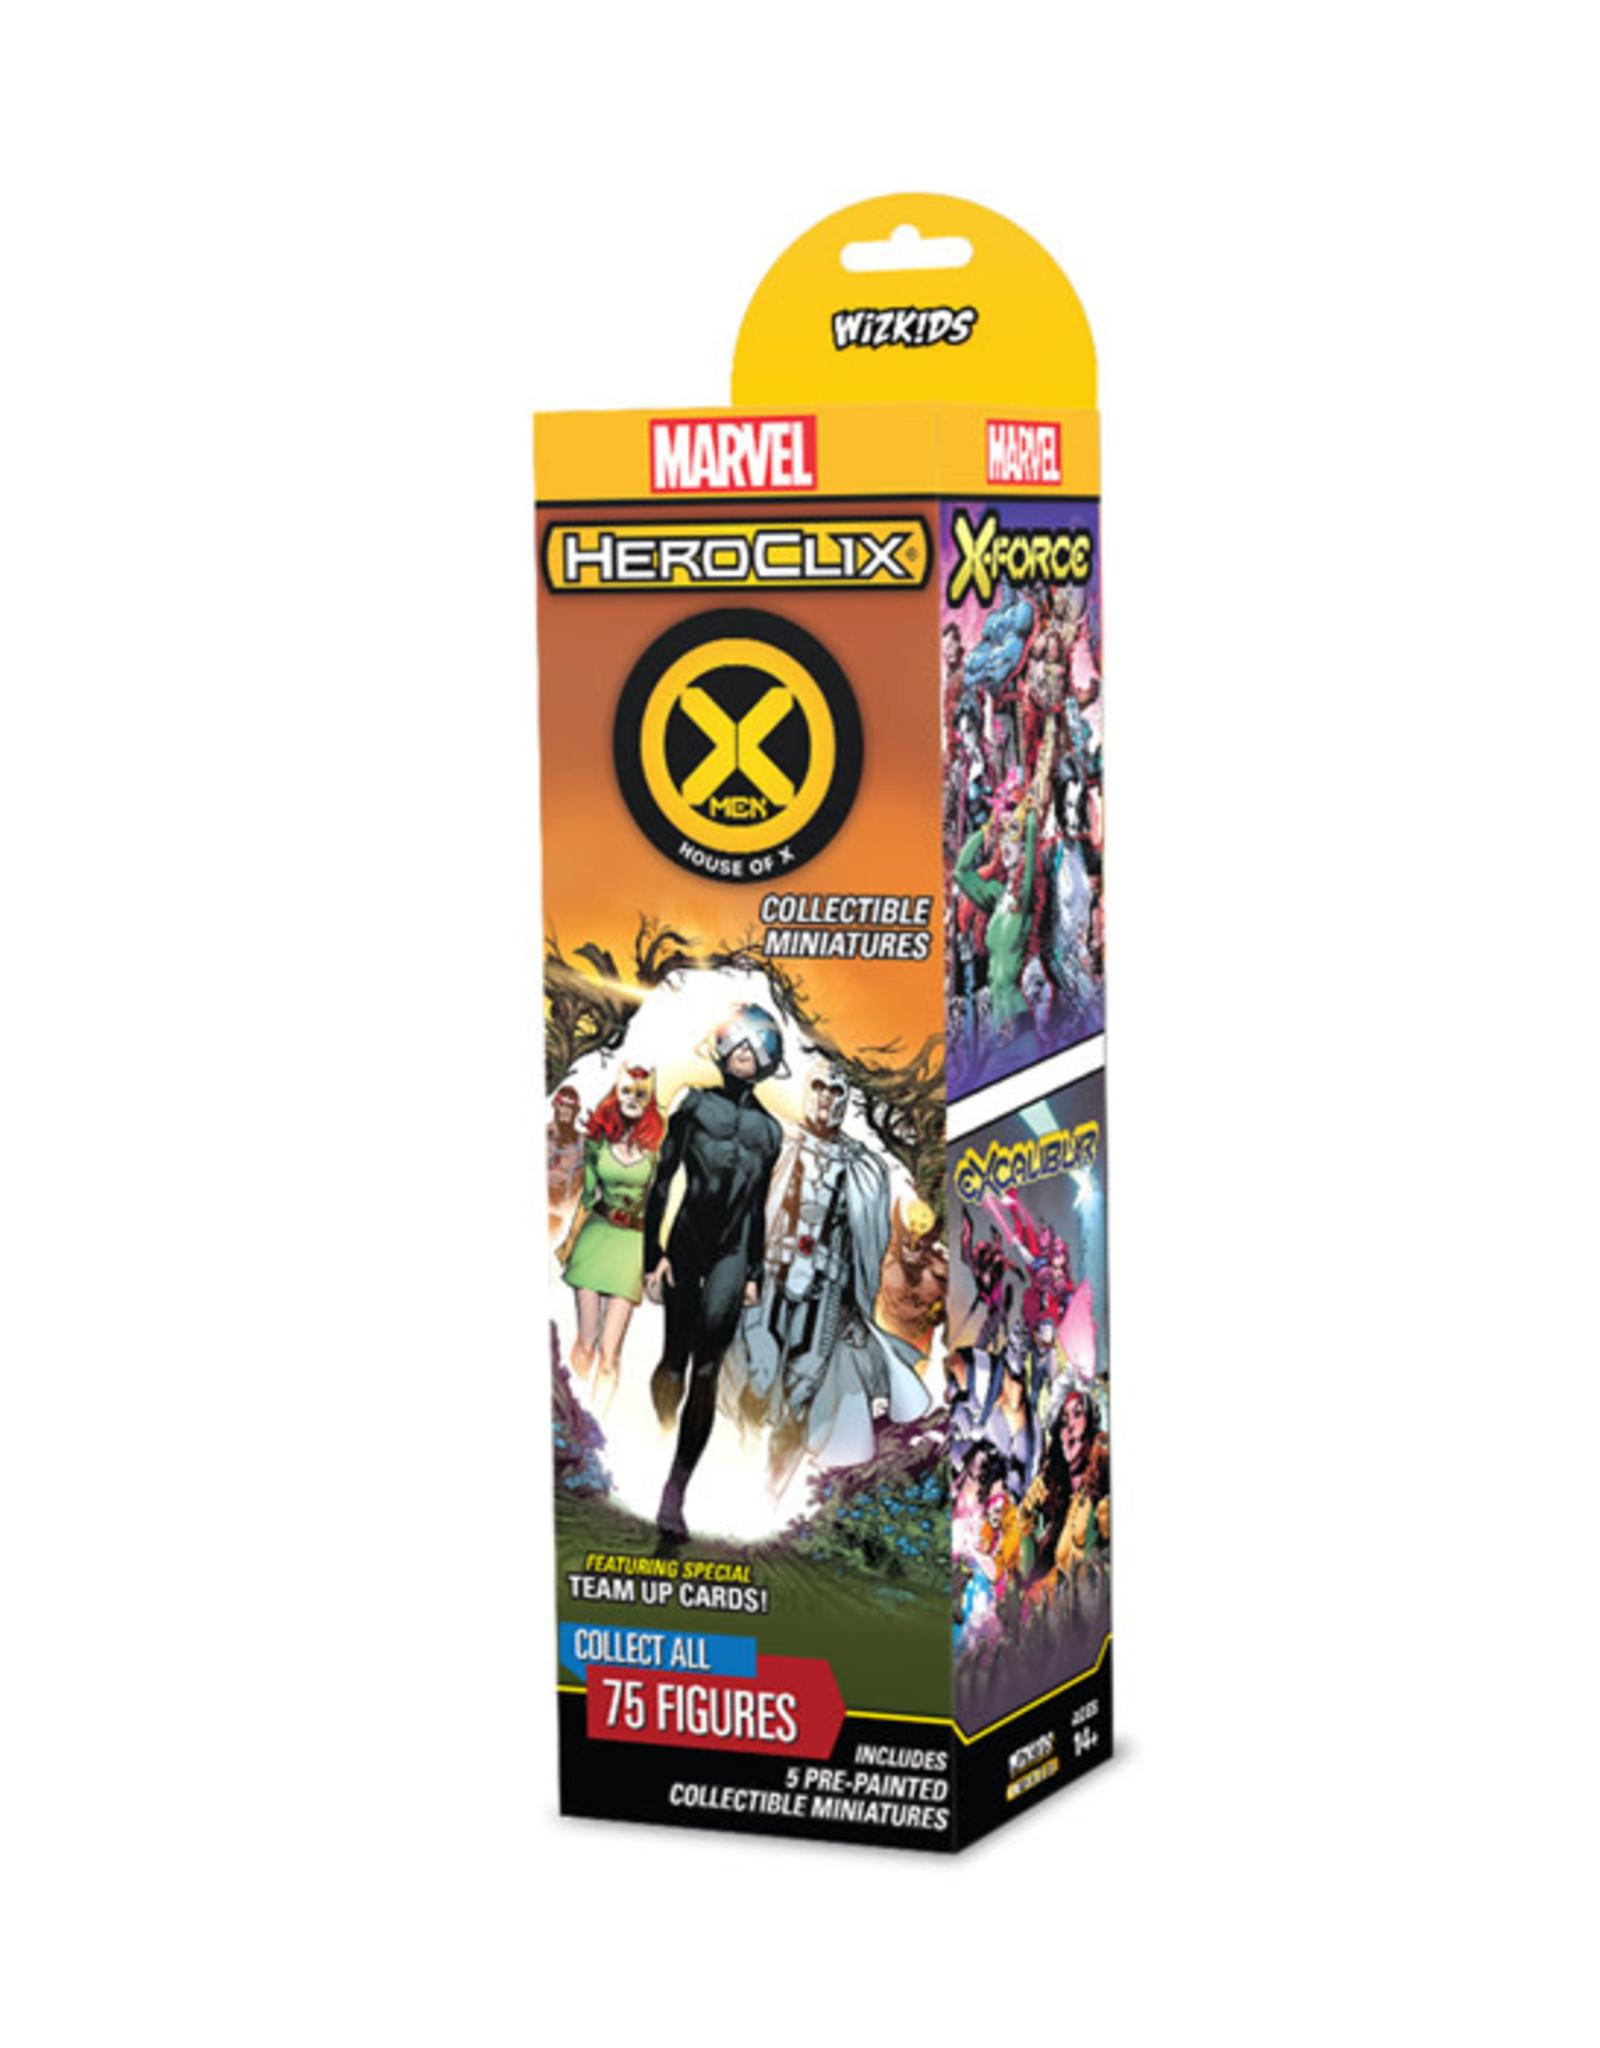 HeroClix HeroClix: X-Men - House of X - Booster Pack